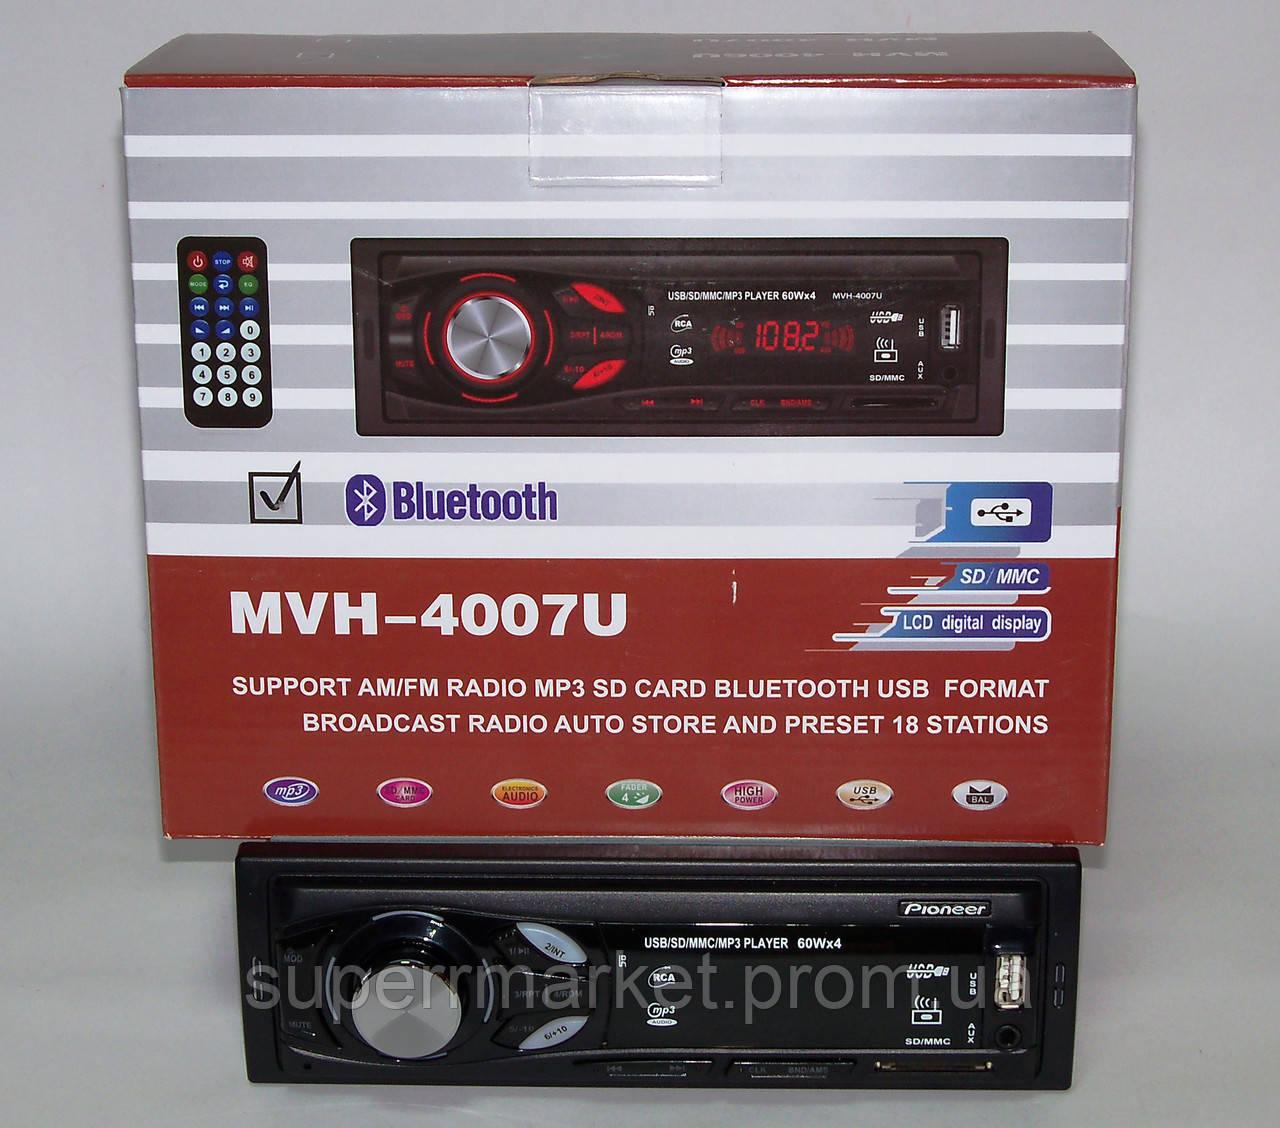 Автомагнитола Pioneer MVH-4007U 60W ISO FM MP3 SD MMC USB AUX CLK